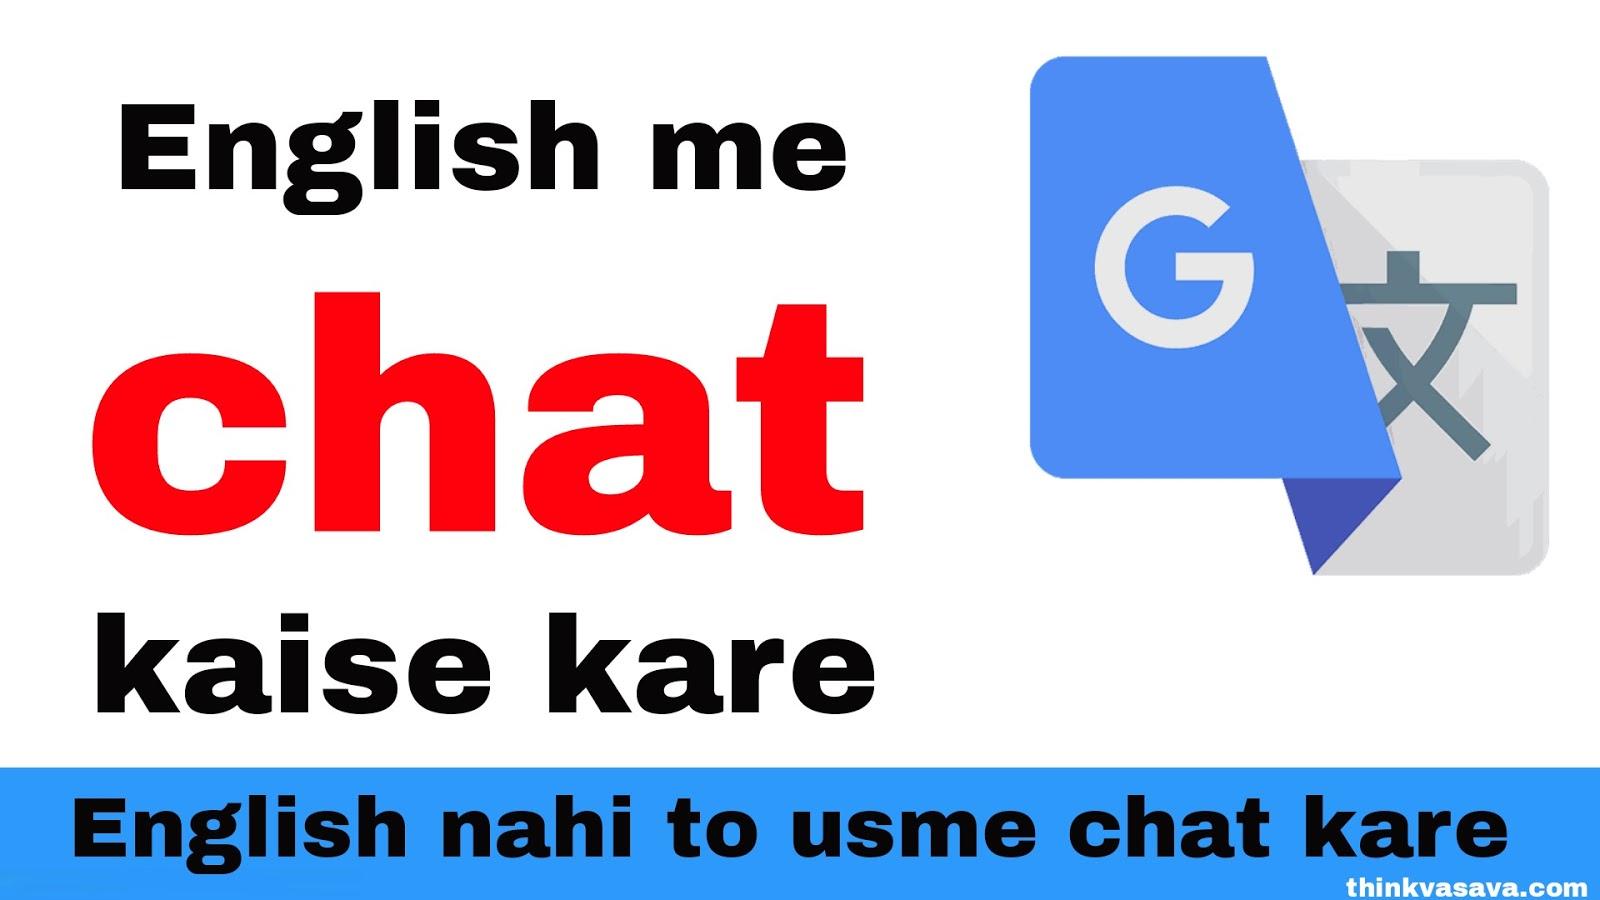 english me chat kaise kare agar nahi aati to